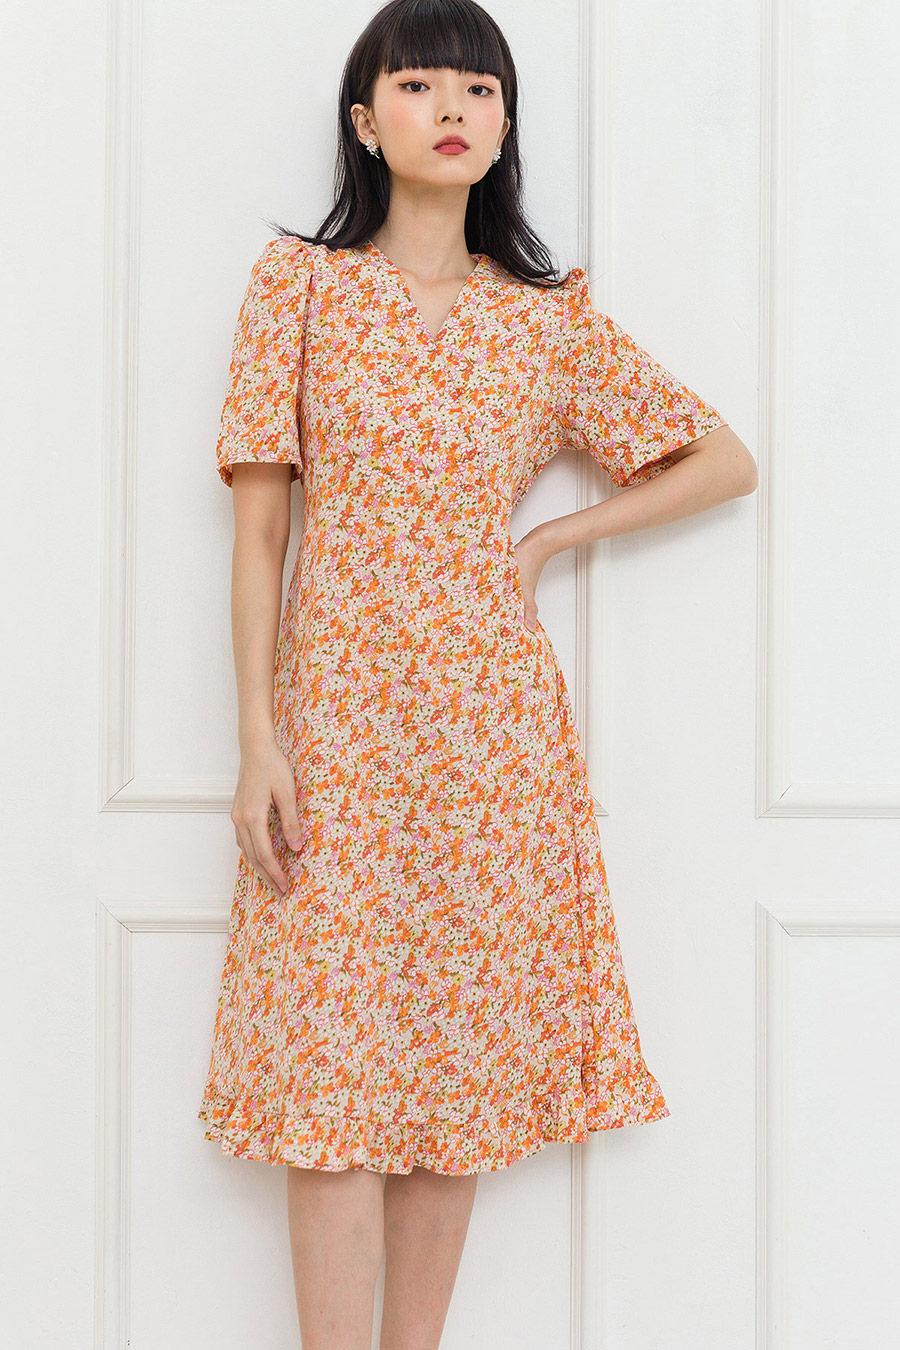 MELLIE DRESS - CAPRI FLEUR